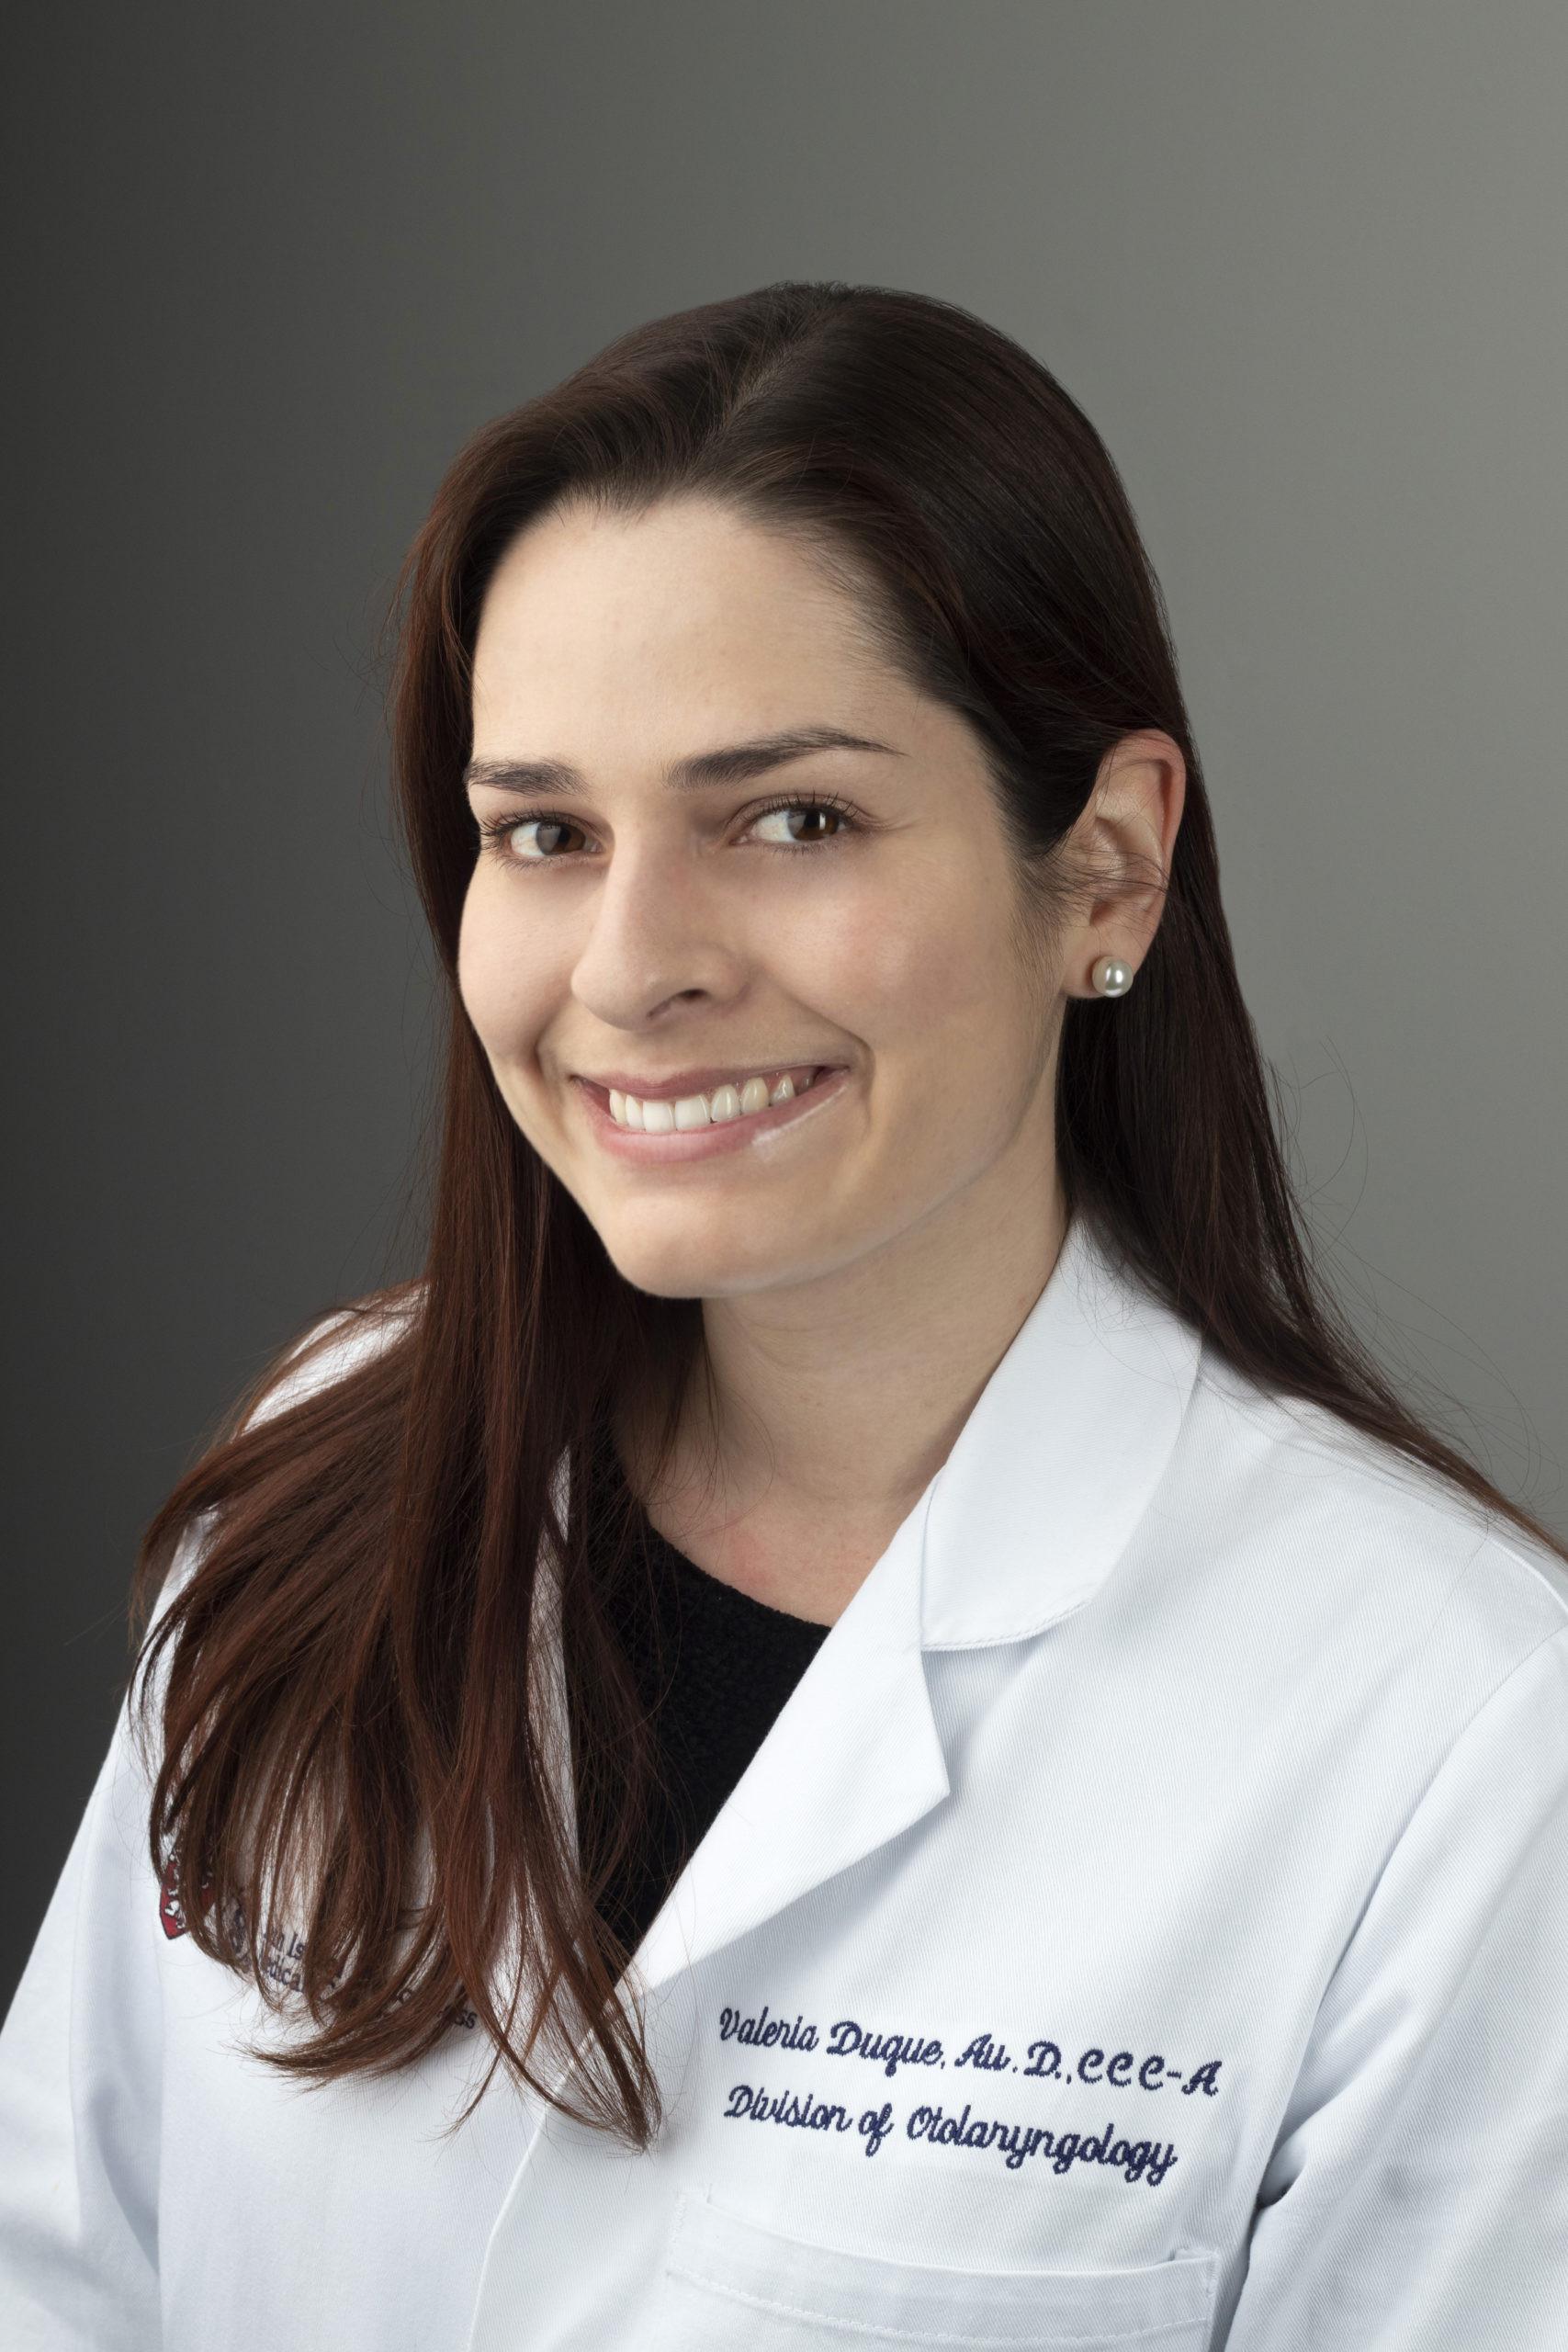 Valeria Duque, Au.D., CCC-A's avatar